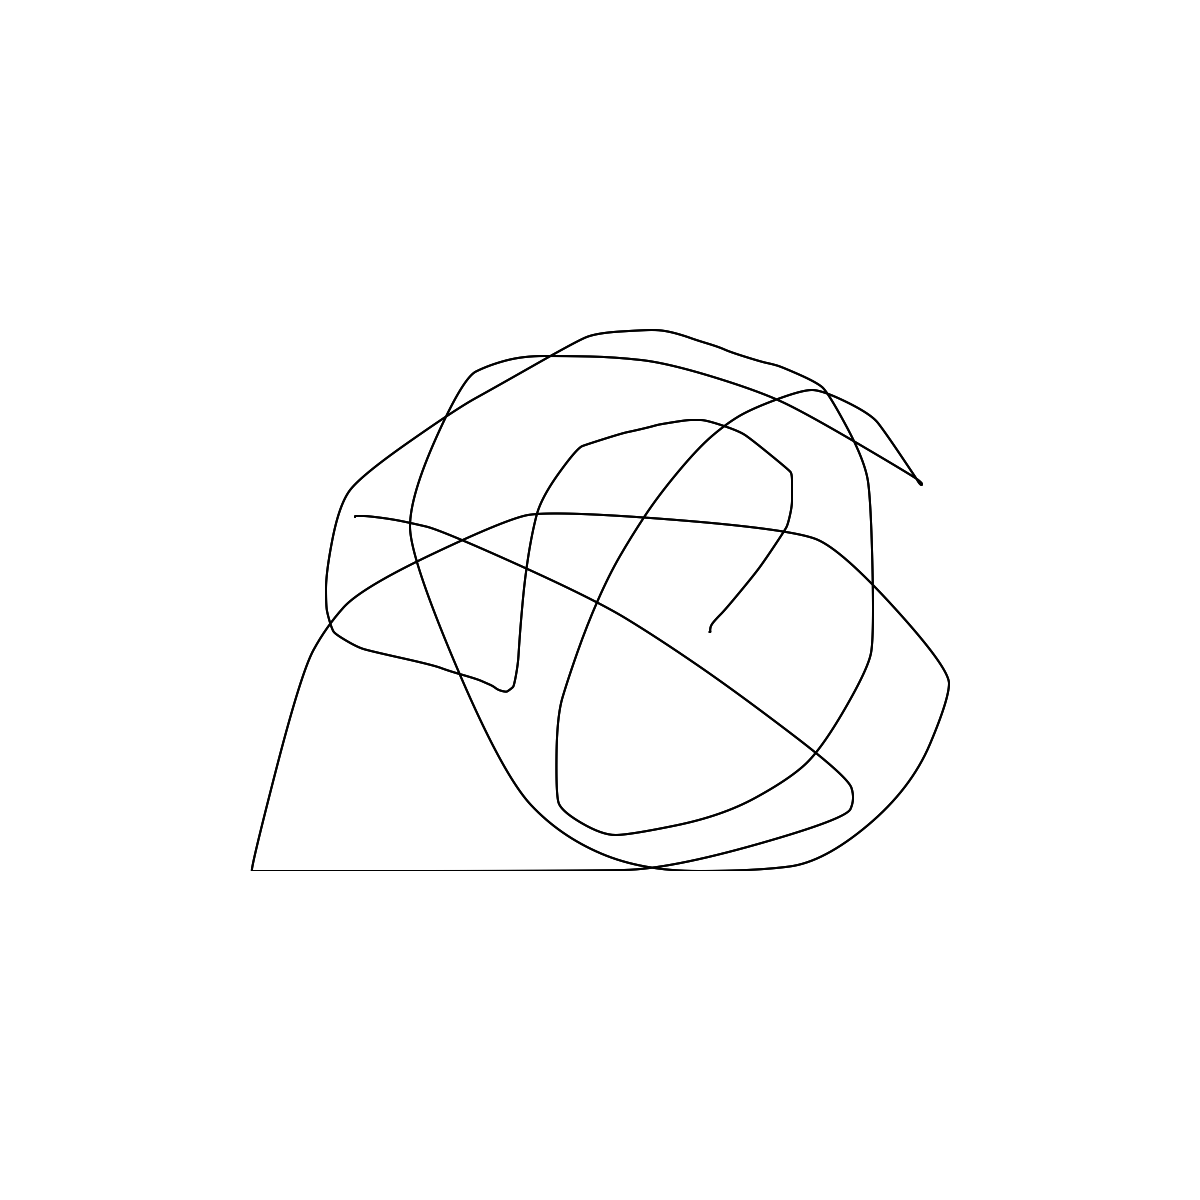 BAAAM drawing#352 lat:43.3124198913574200lng: -79.8373489379882800